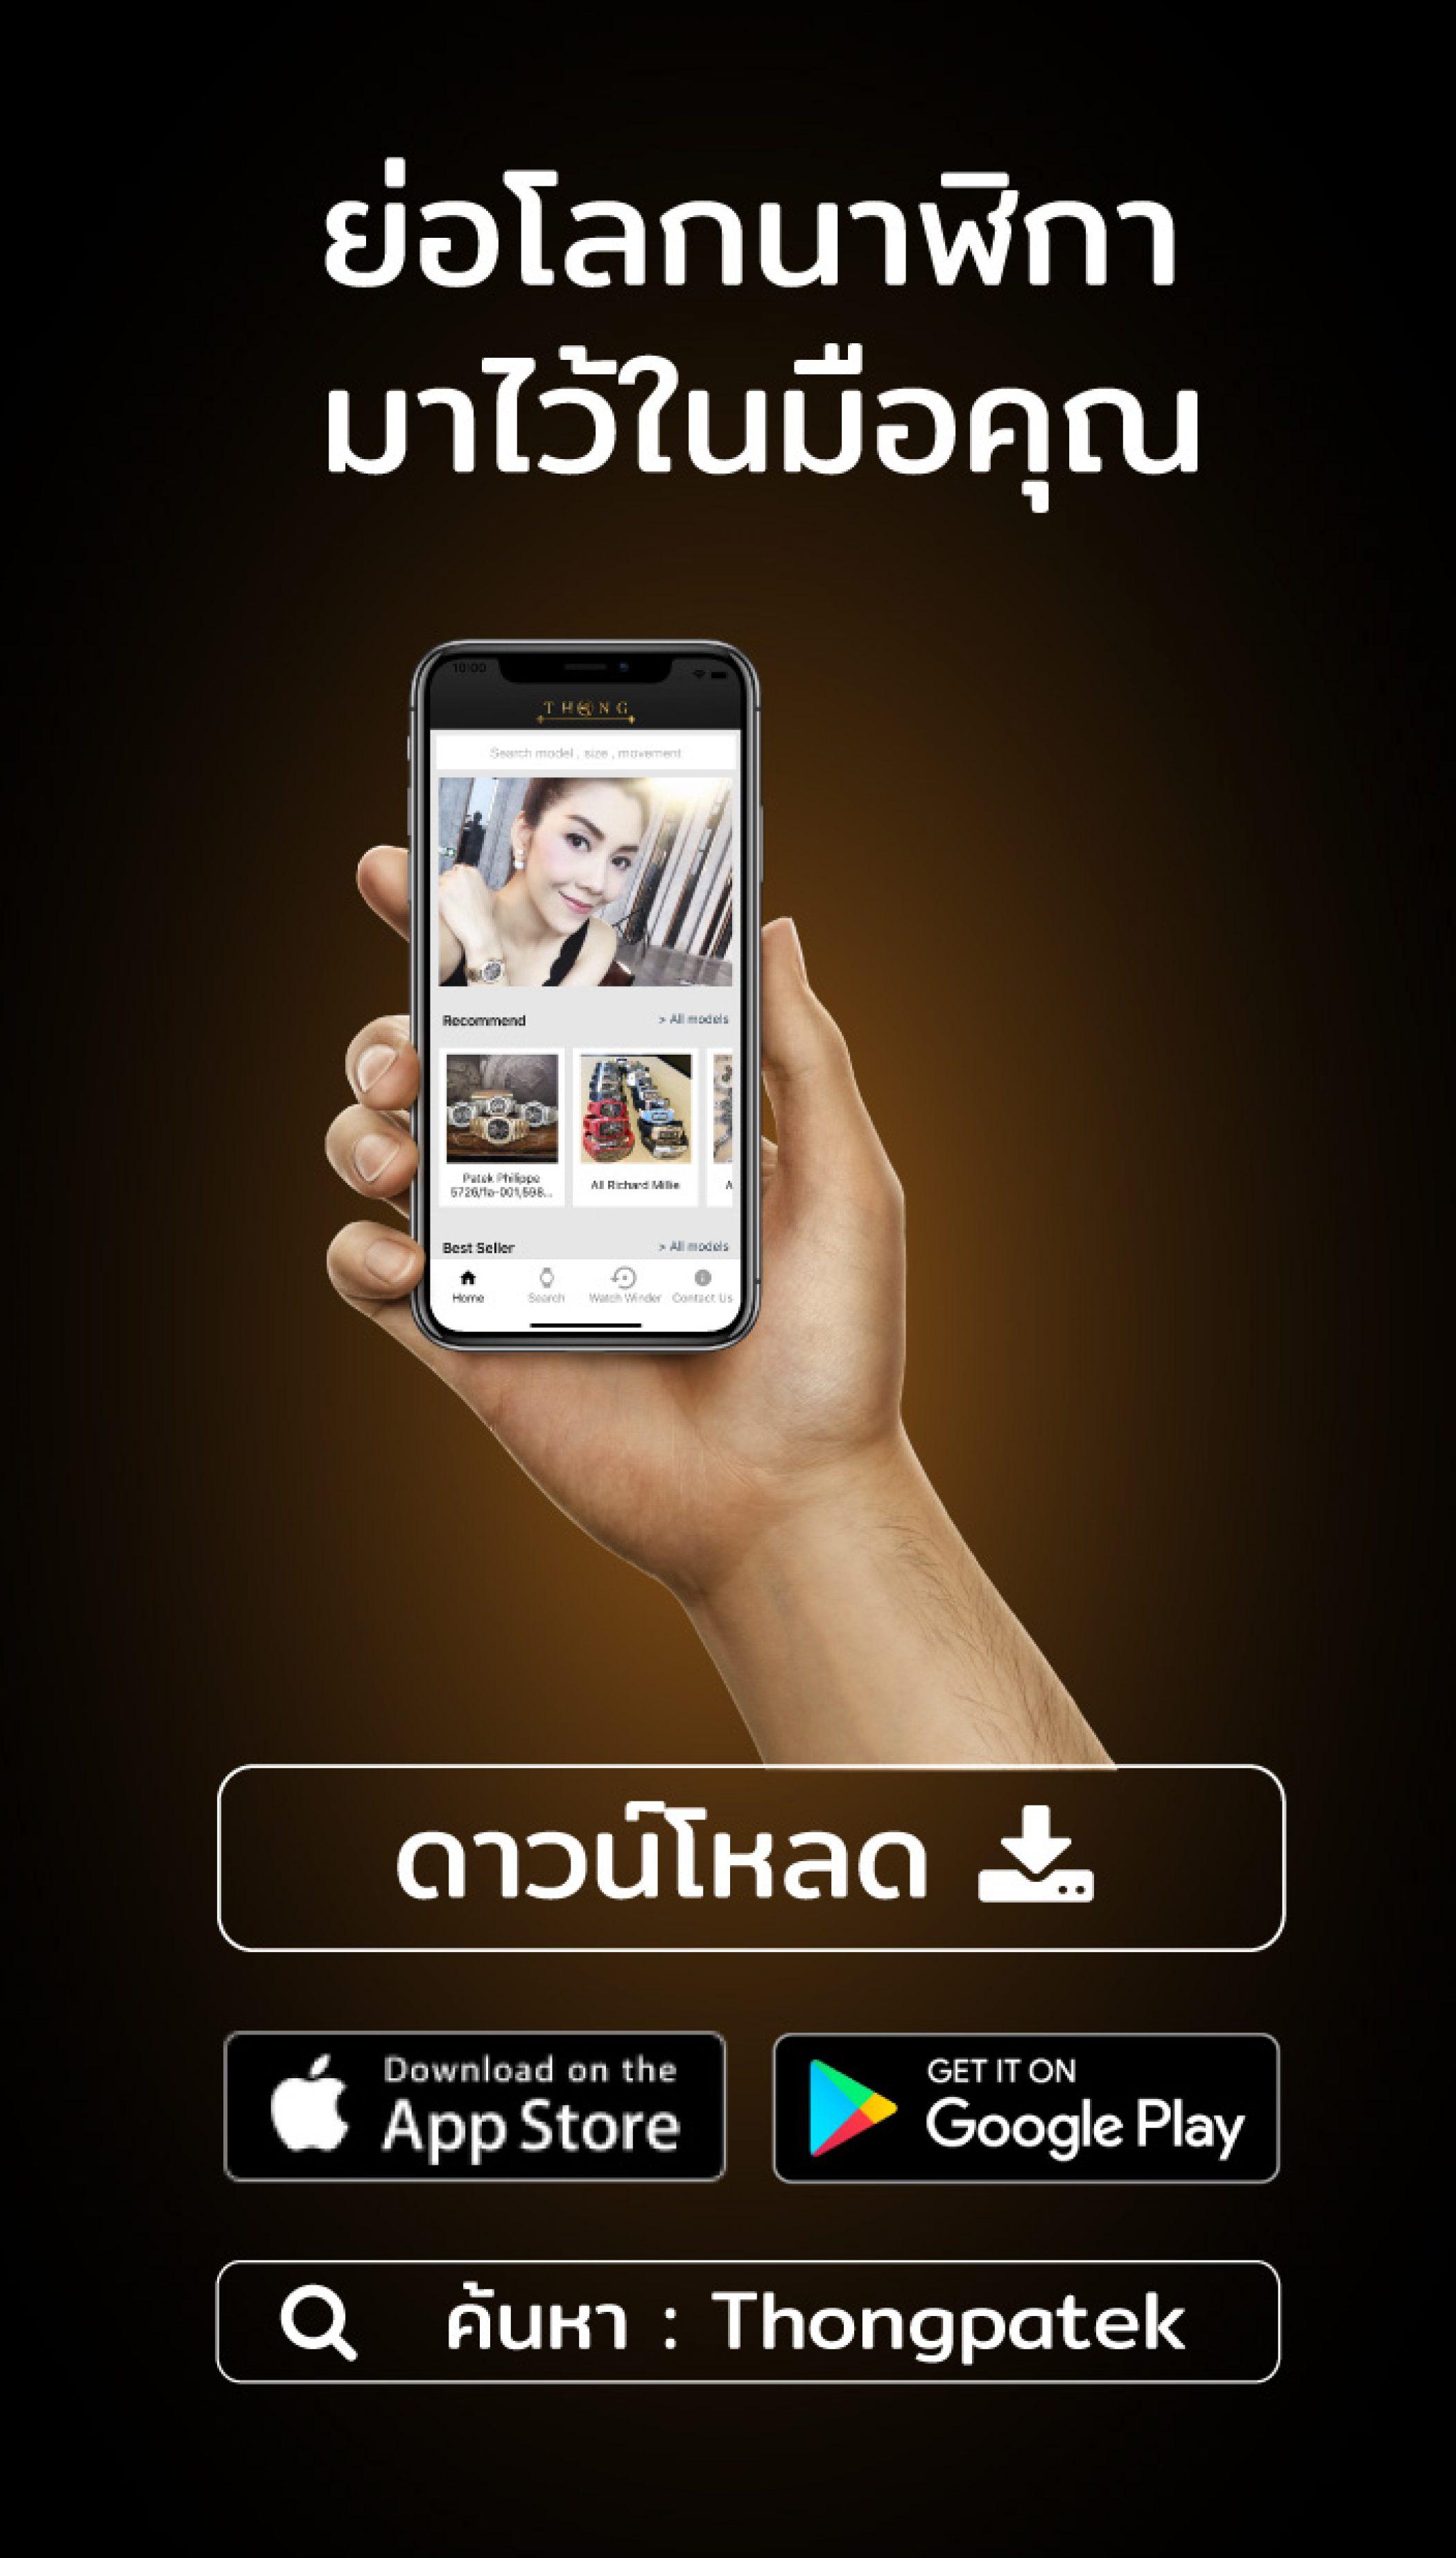 thong-mobile-app-banner-for-mobile2